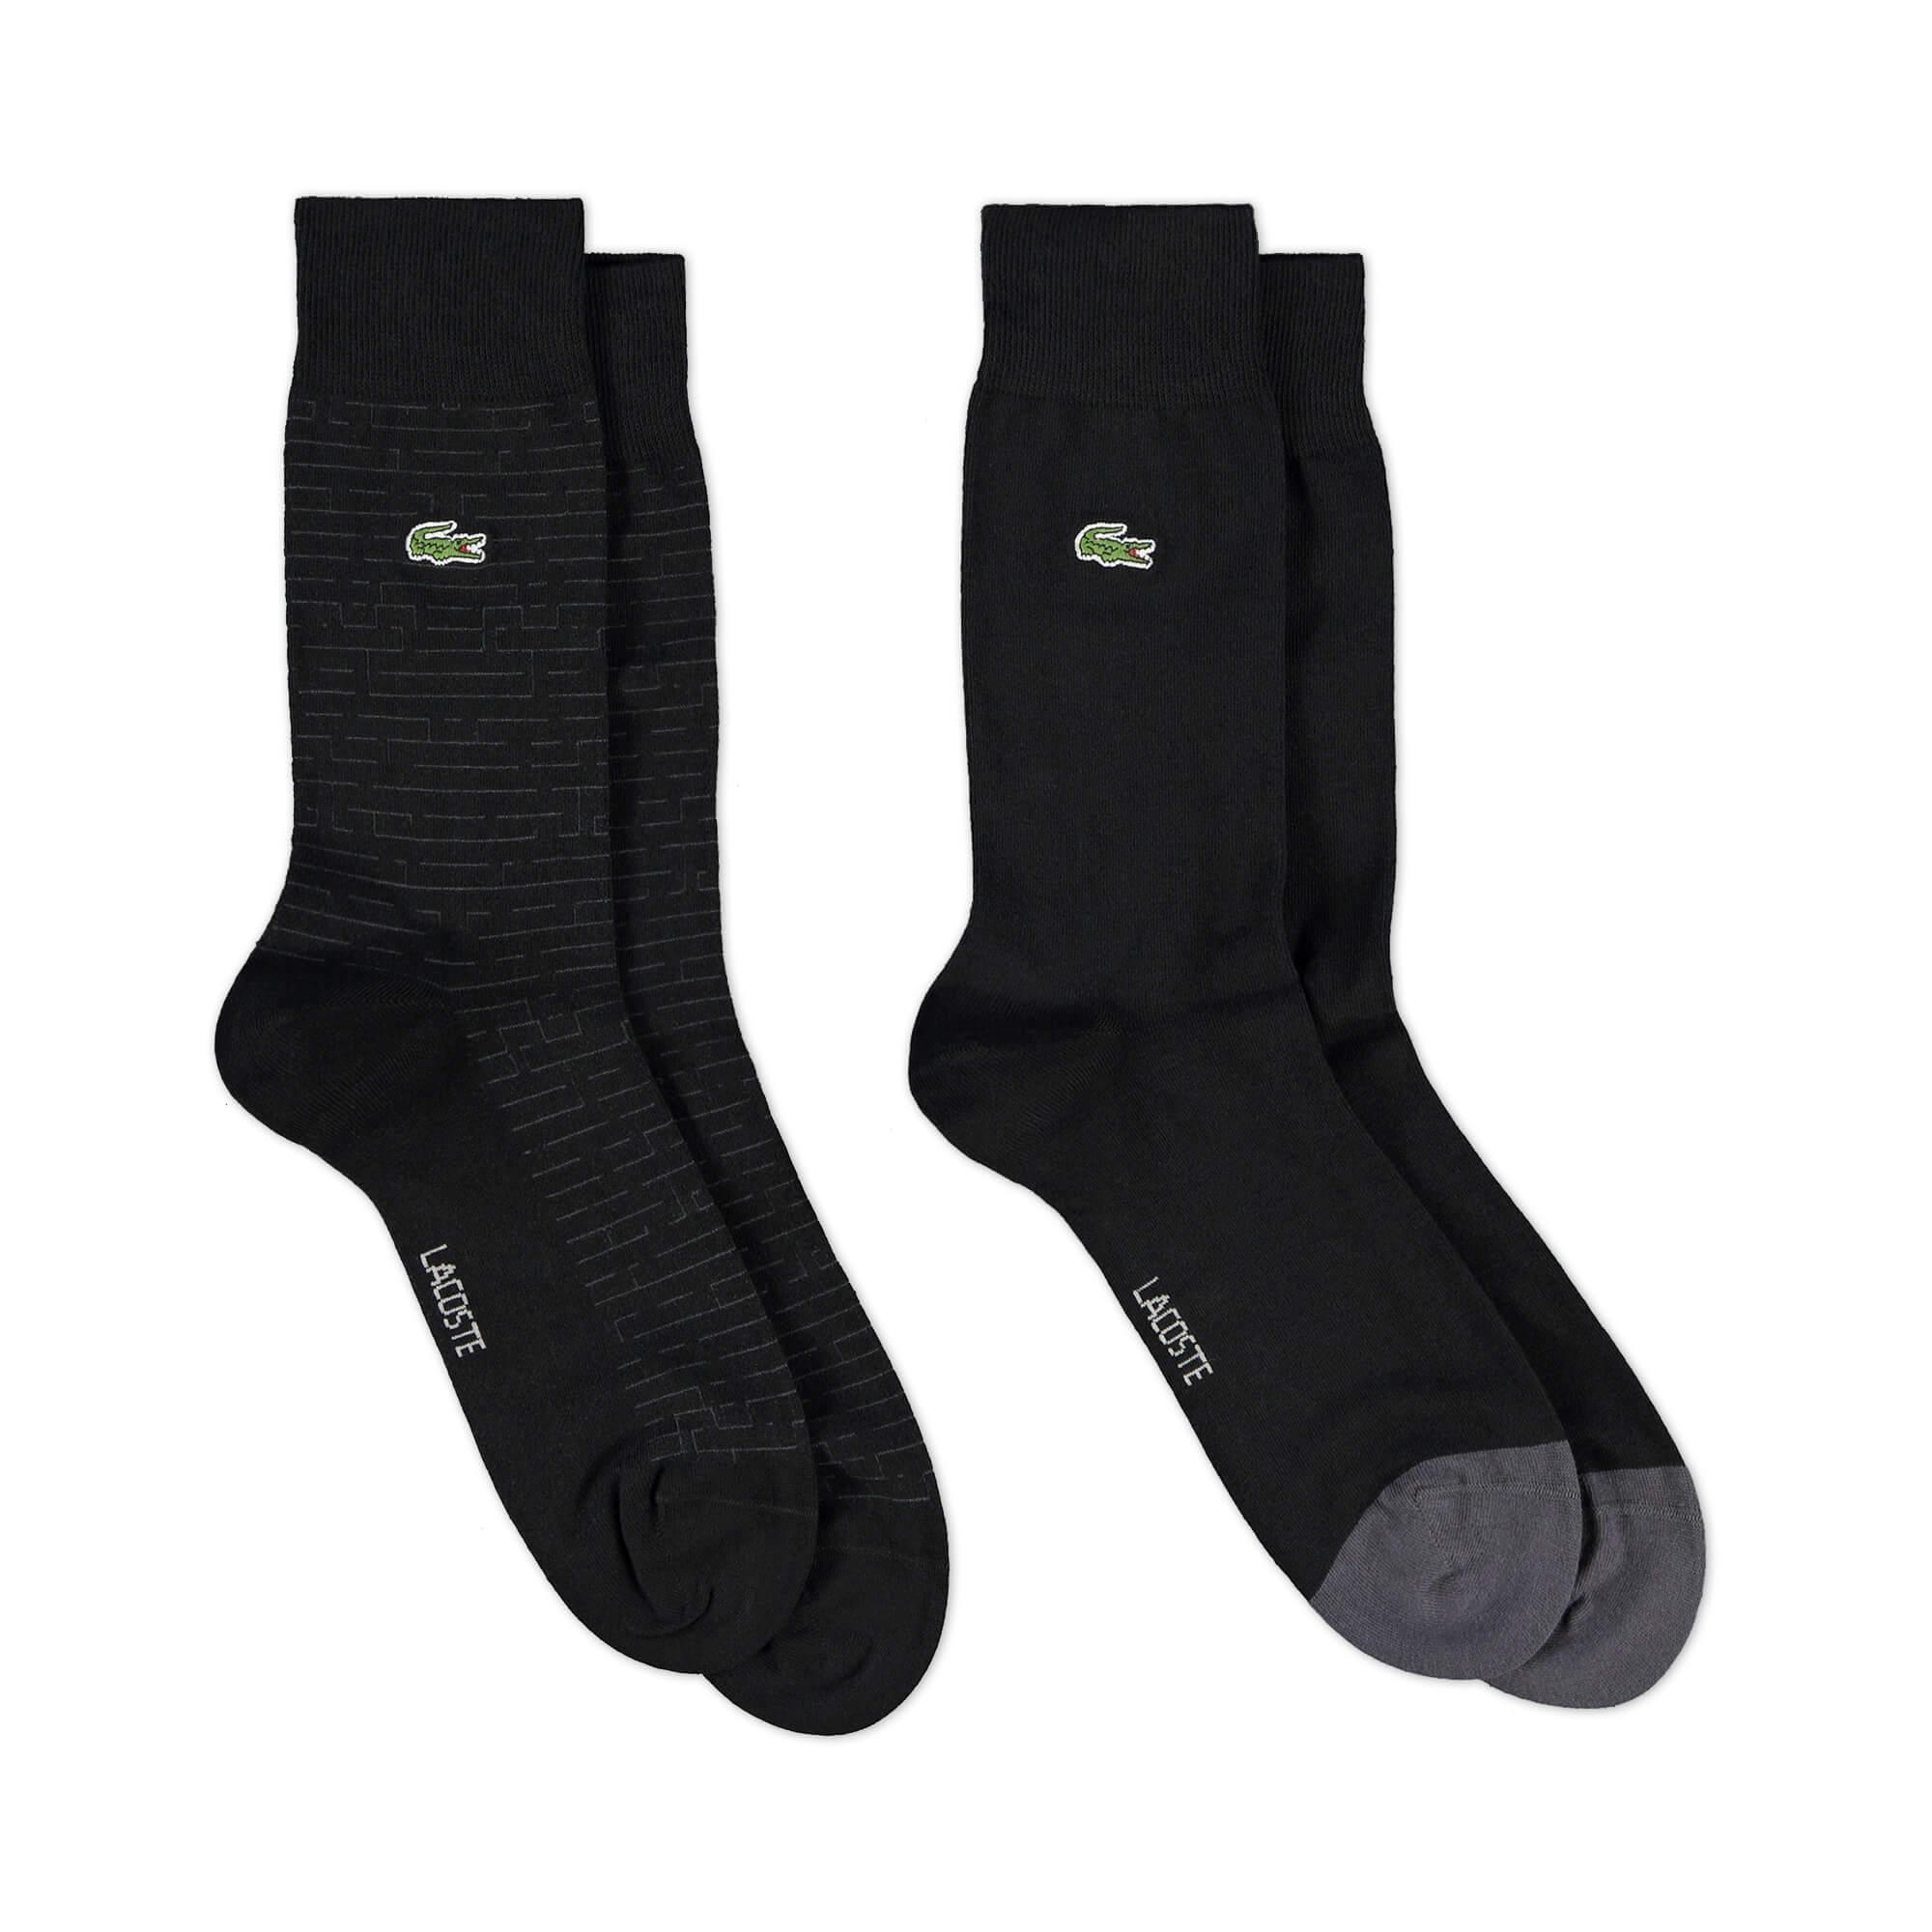 Lacoste Erkek 2'li Siyah Çorap